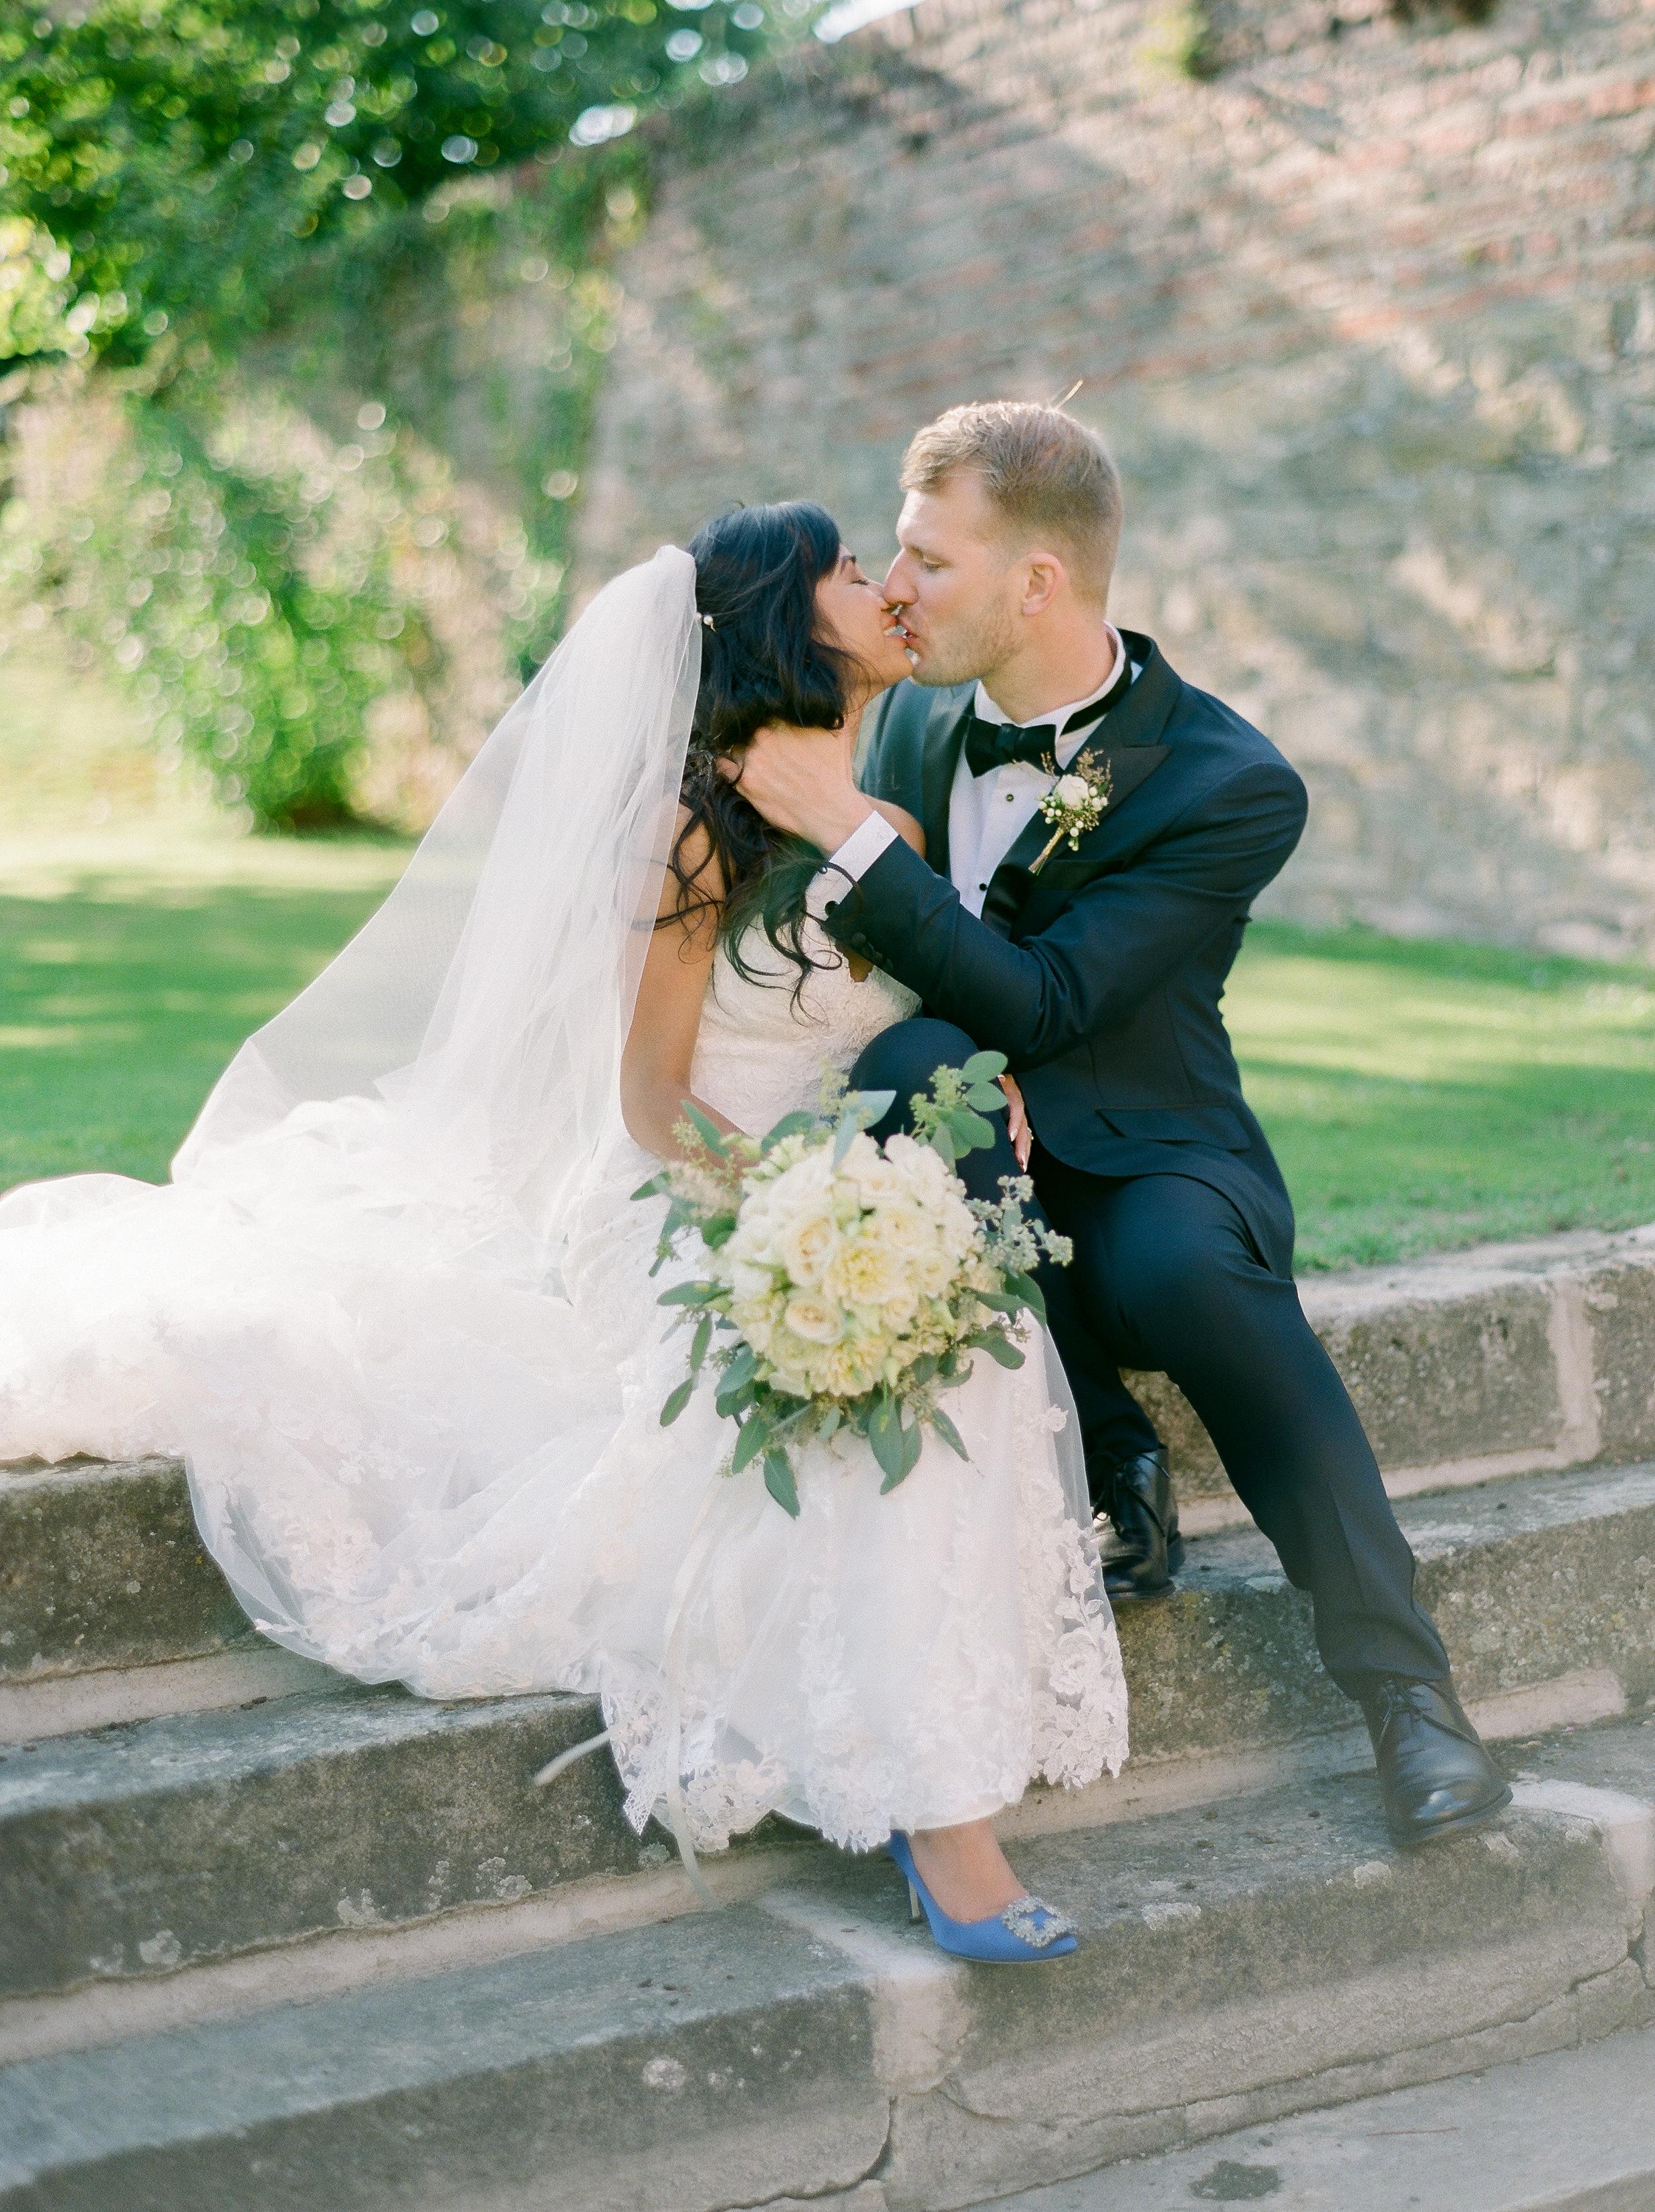 Opulent Castle Wedding at Schloss Wilkinghege -